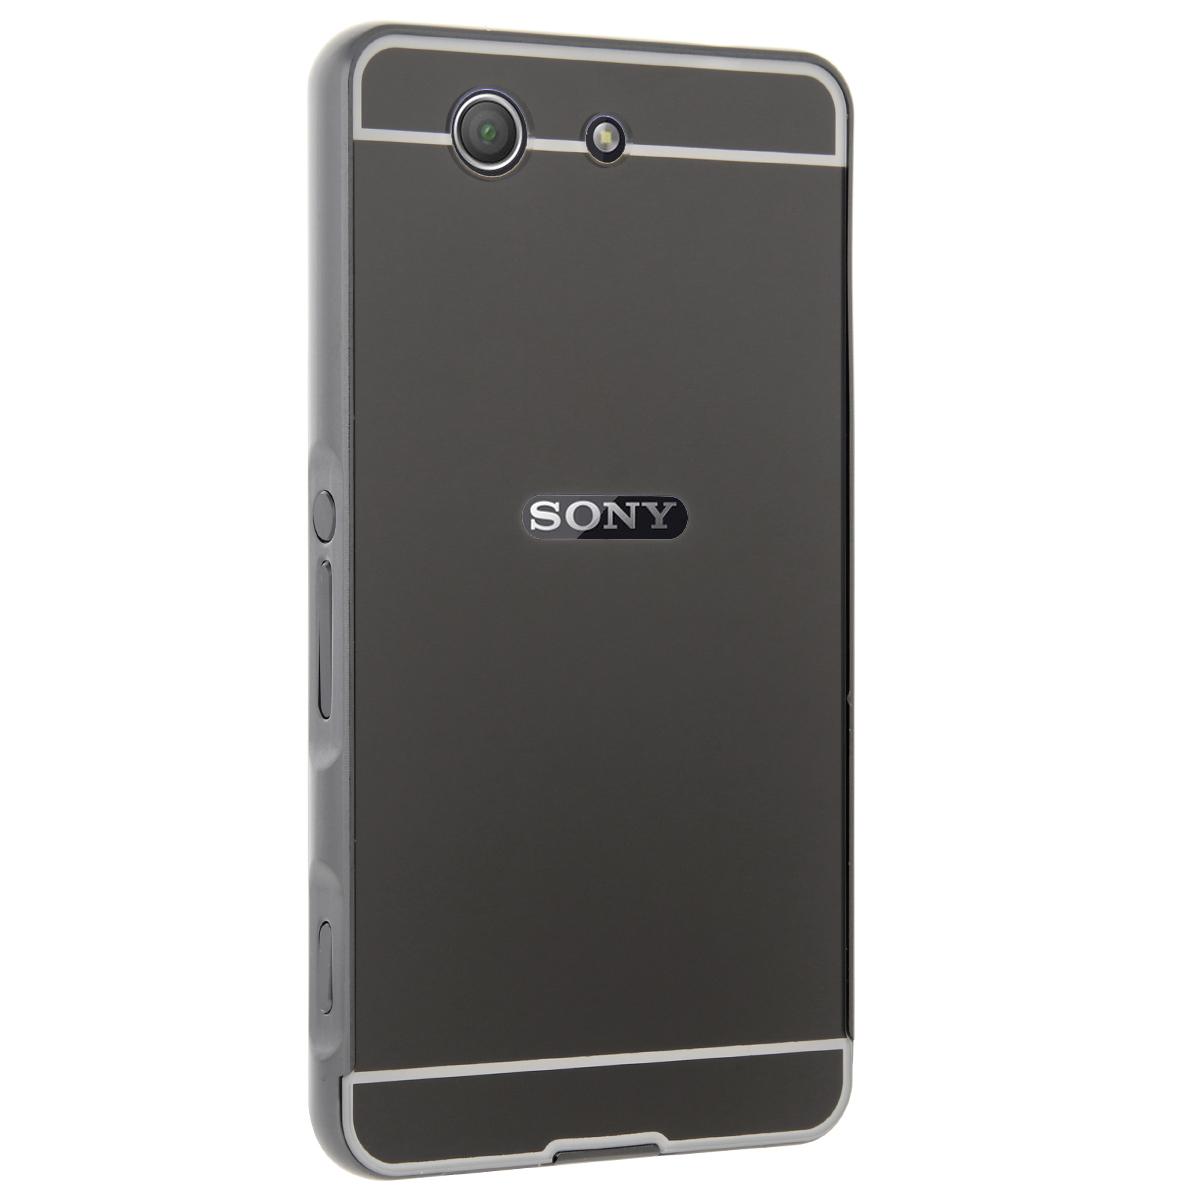 RUILEAN Luxury Metal Aluminum Bumper for Sony Xperia Z3 CompactCase Detachable Mirror Hard .